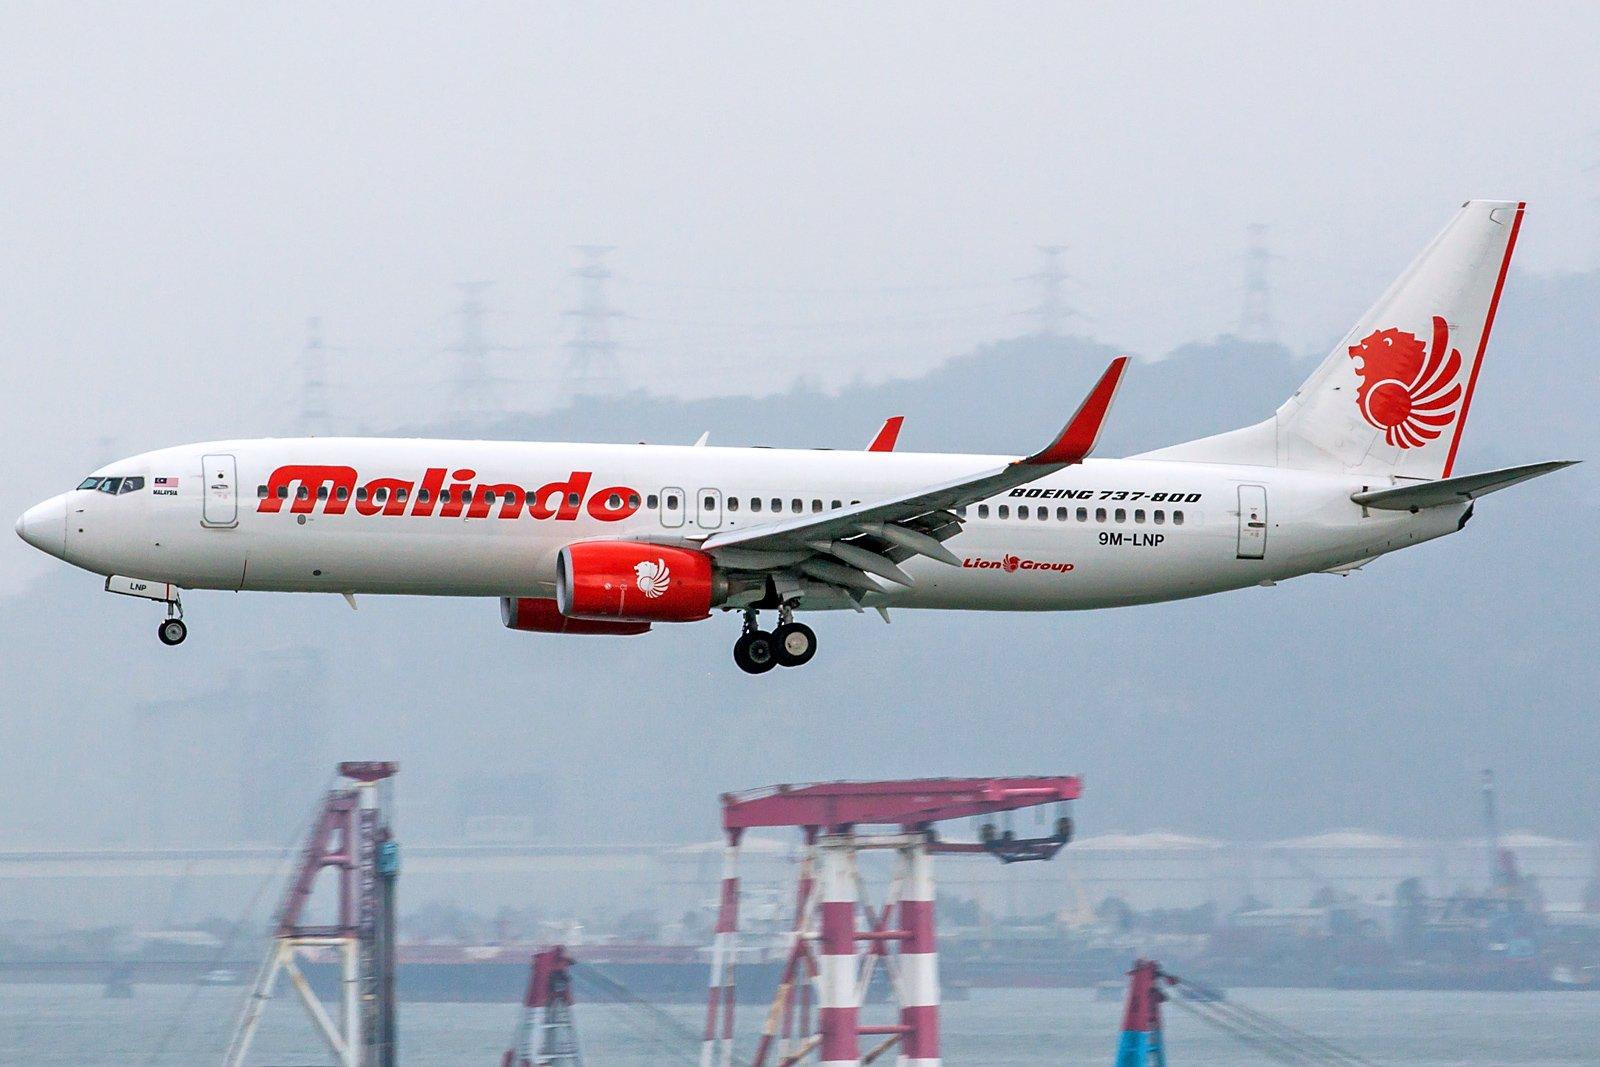 Malindo Air Boeing 737-8GP(WL) 9M-LNP